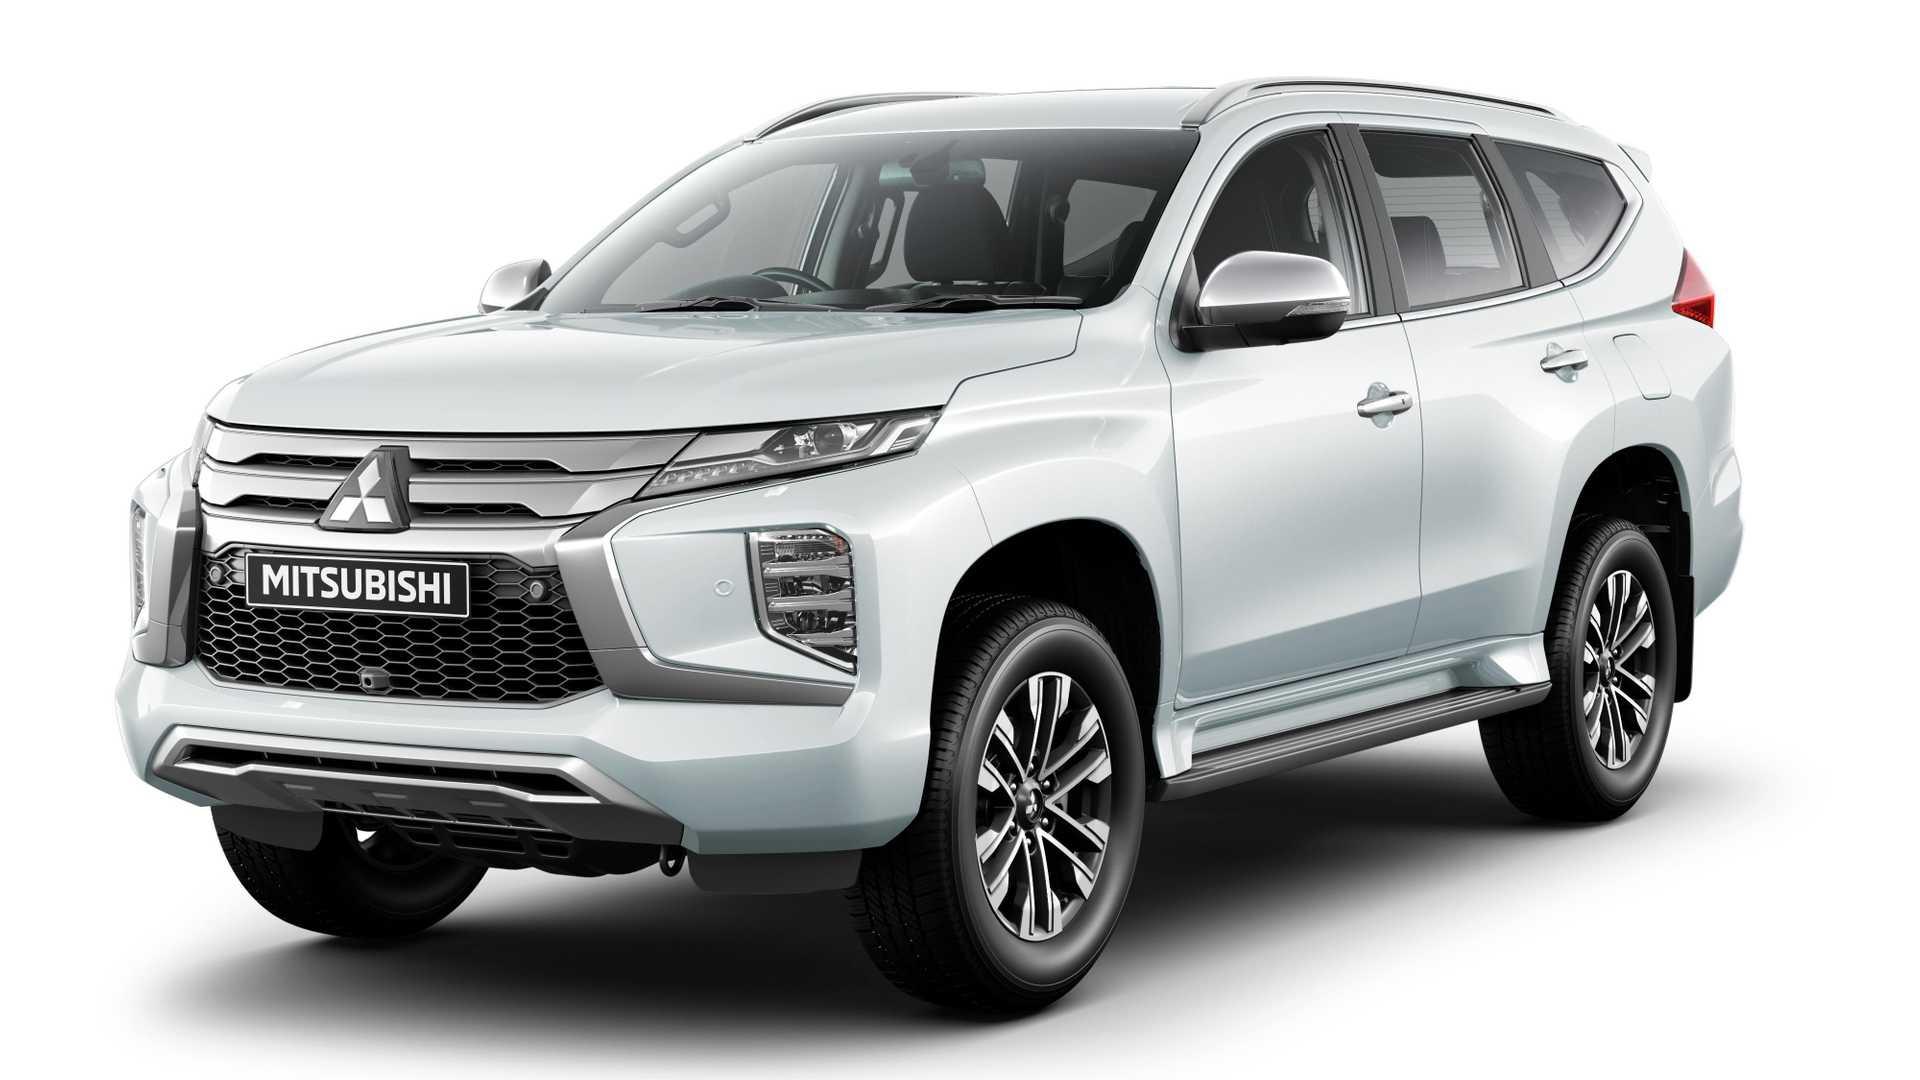 2020_Mitsubishi_Pajero_Sport_facelift_0003